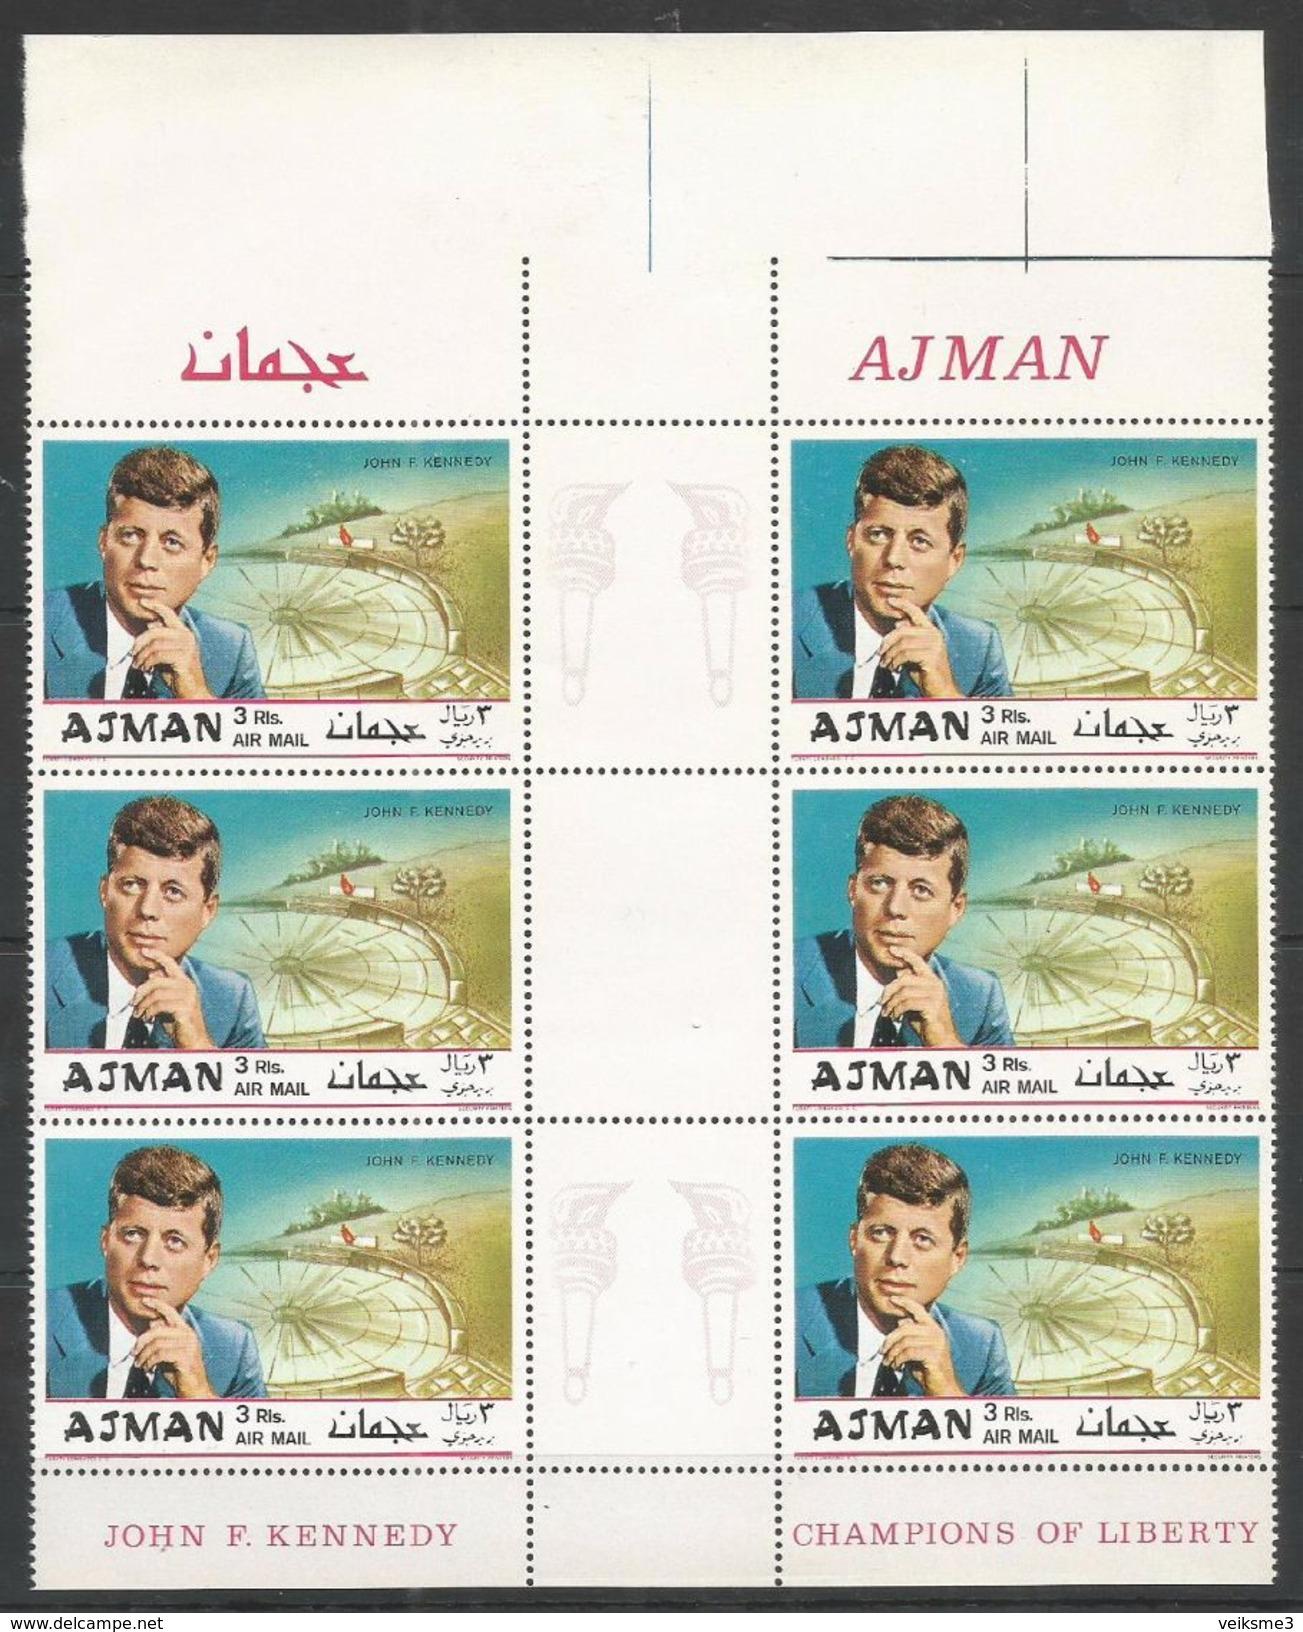 AJMAN - MNH - Famous People - Kennedy - Gutter Parrirs - Kennedy (John F.)